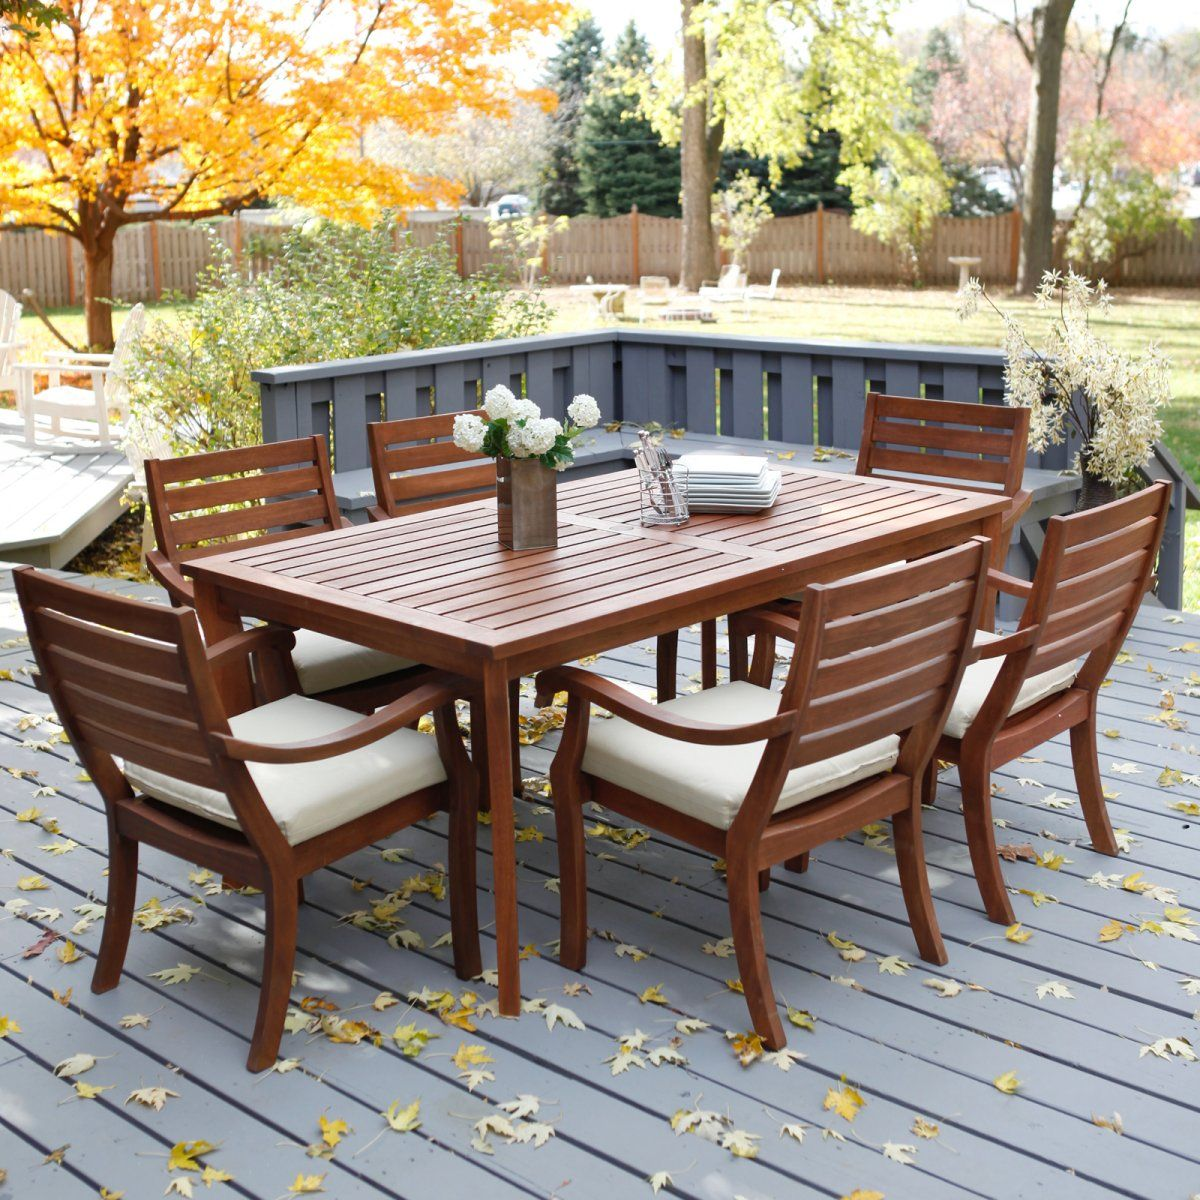 Arbor Patio Dining Set With Optional Umbrella Seats 6 Herb